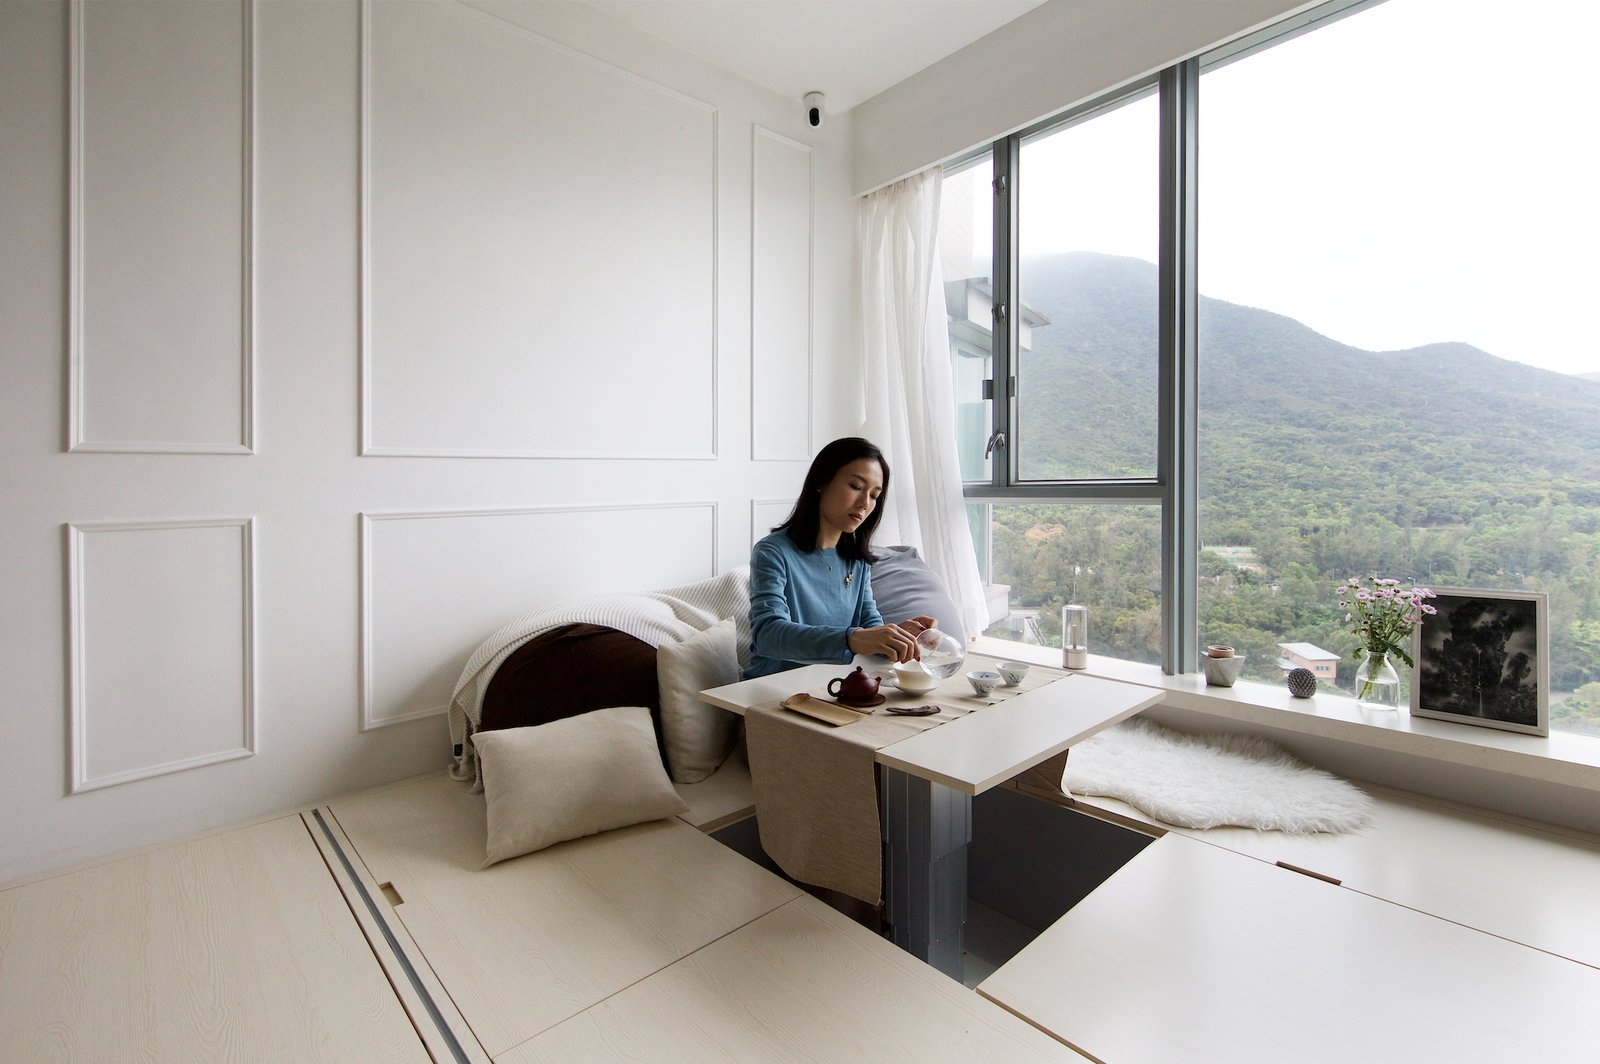 The coffee table in the living room at Smart Zendo by Sim-Plex Design Studio.